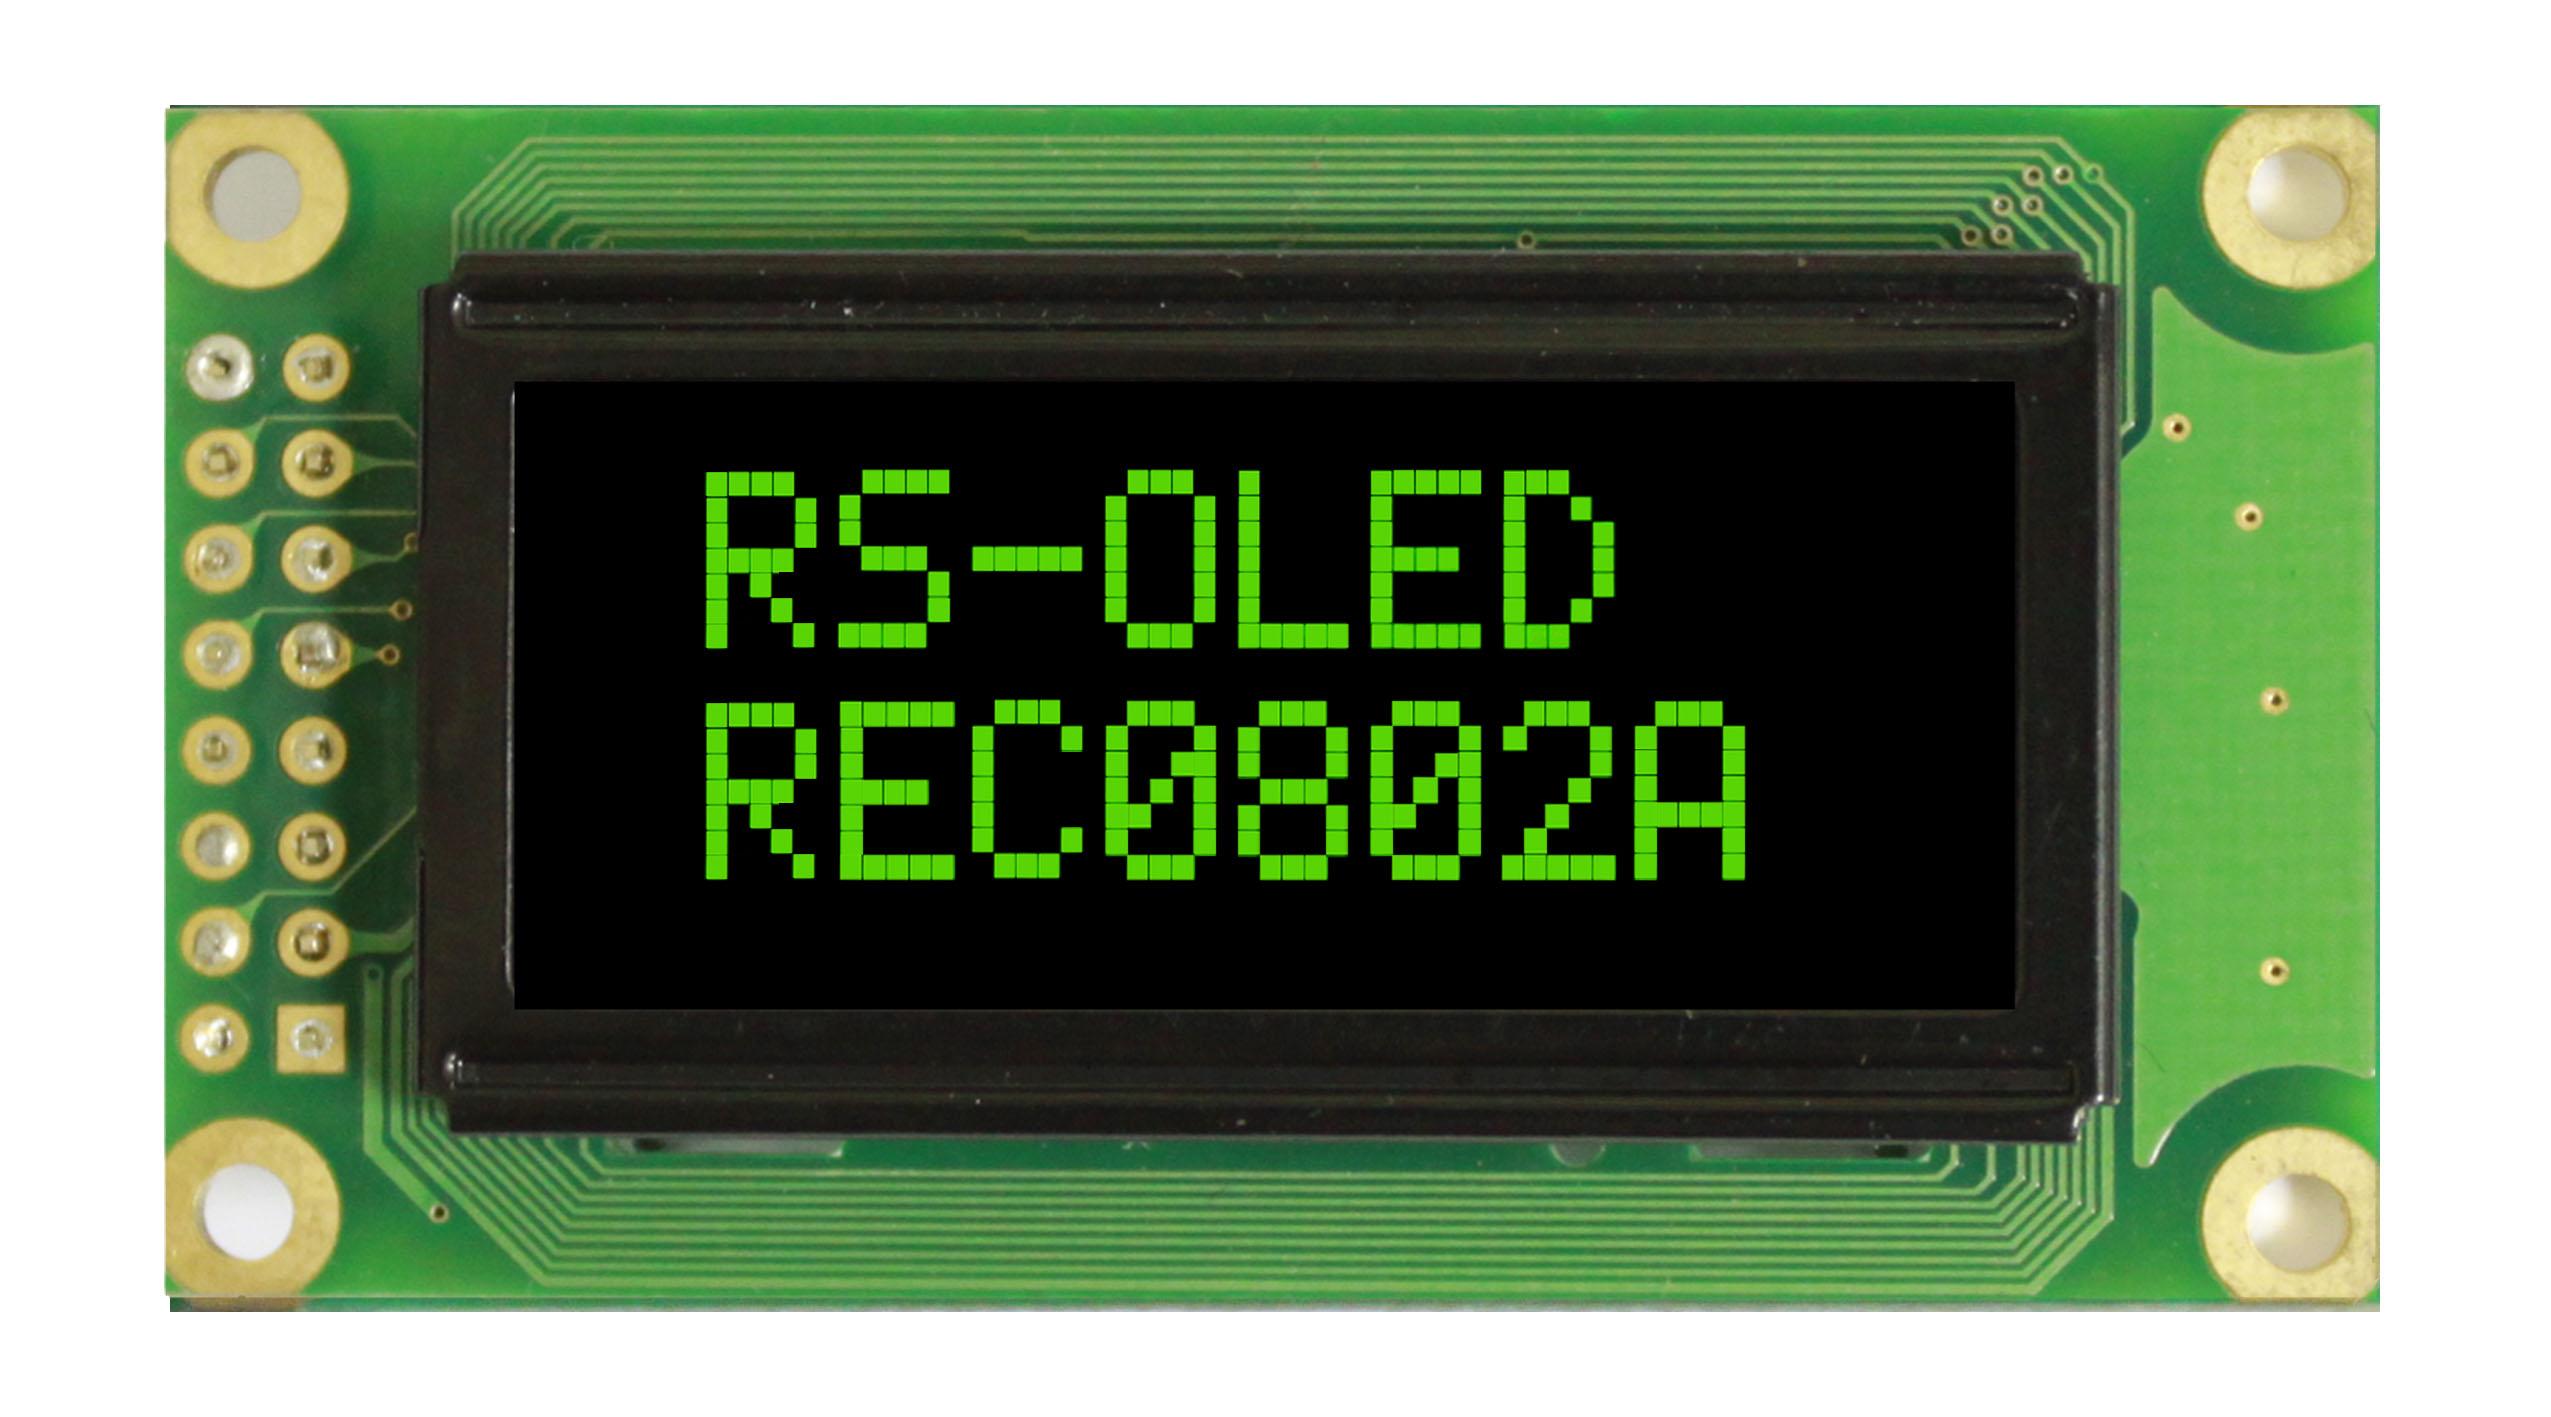 Знакосинтезирующие OLED-дисплеи от компании Raystar Optronics: достойная замена LCD-индикаторам